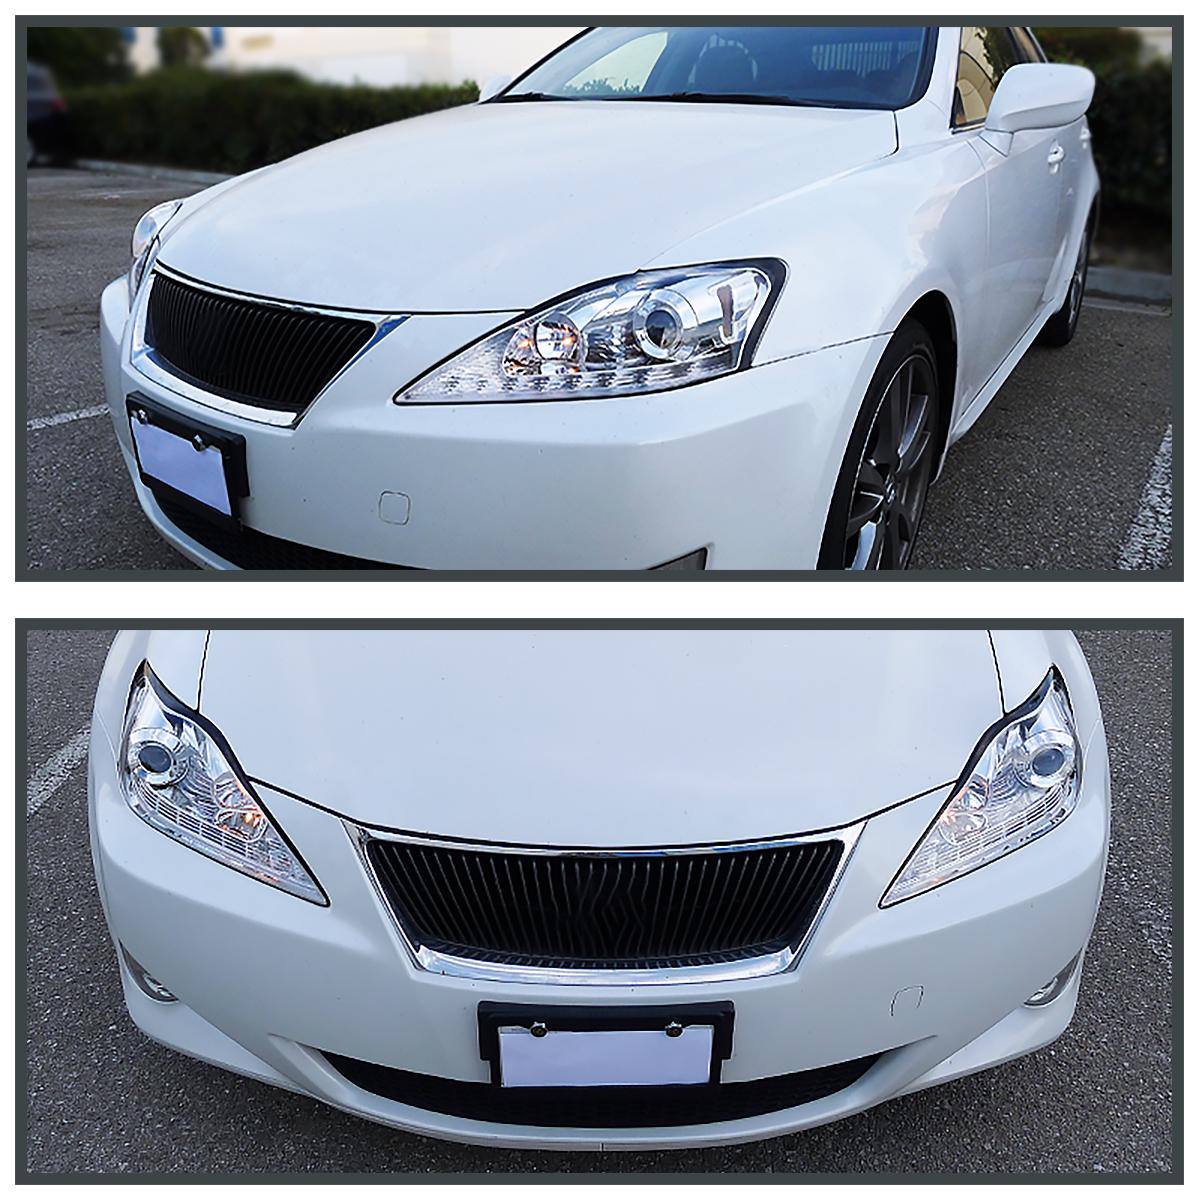 2006-2009 Lexus IS250 Chrome LED DRL+Turn Signal Strip